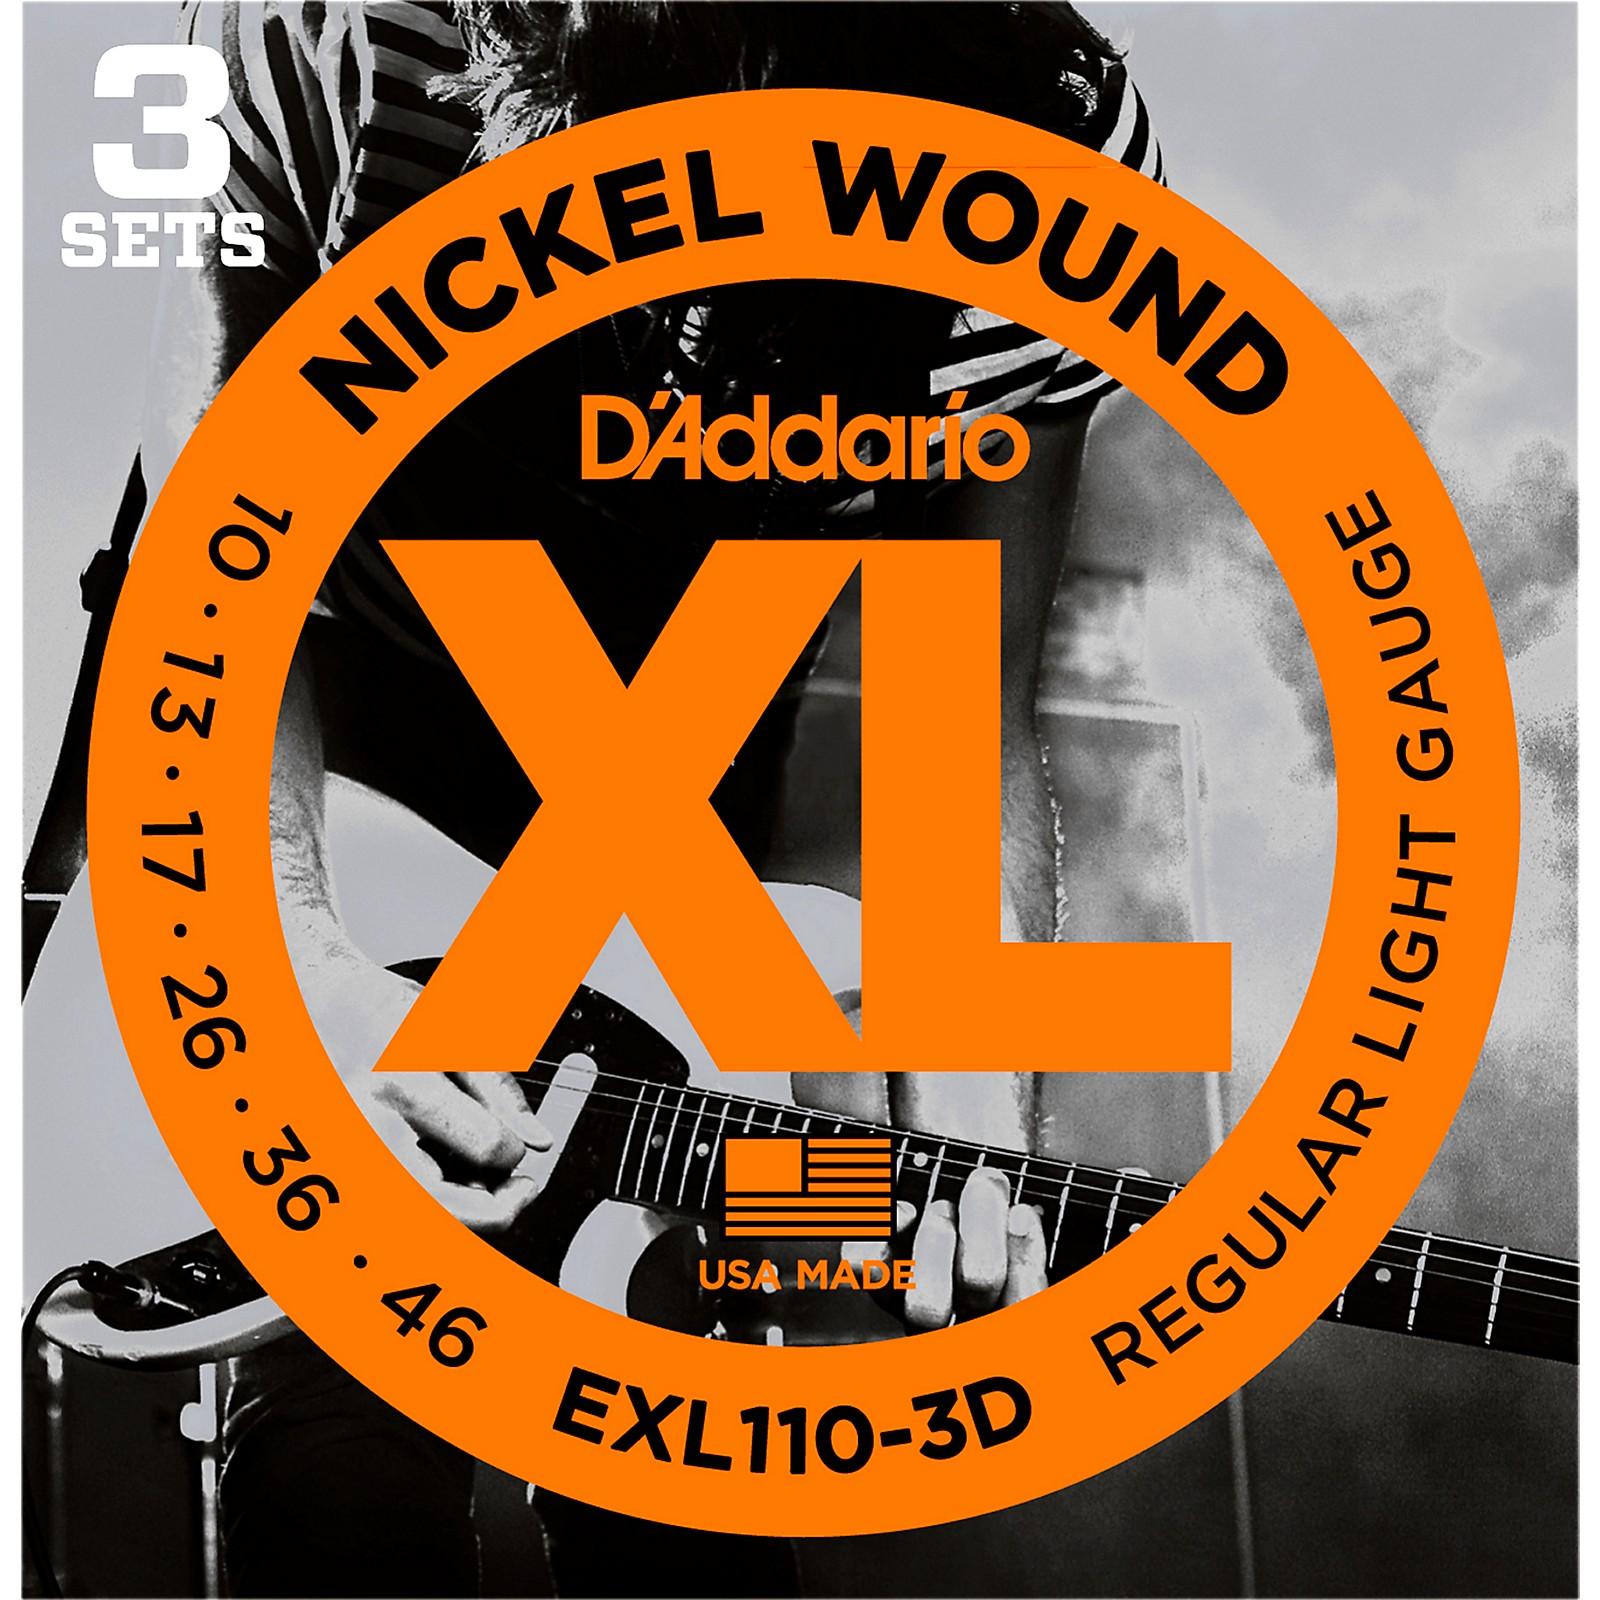 D'Addario EXL110 Nickel Light Electric Guitar Strings 3-Pack